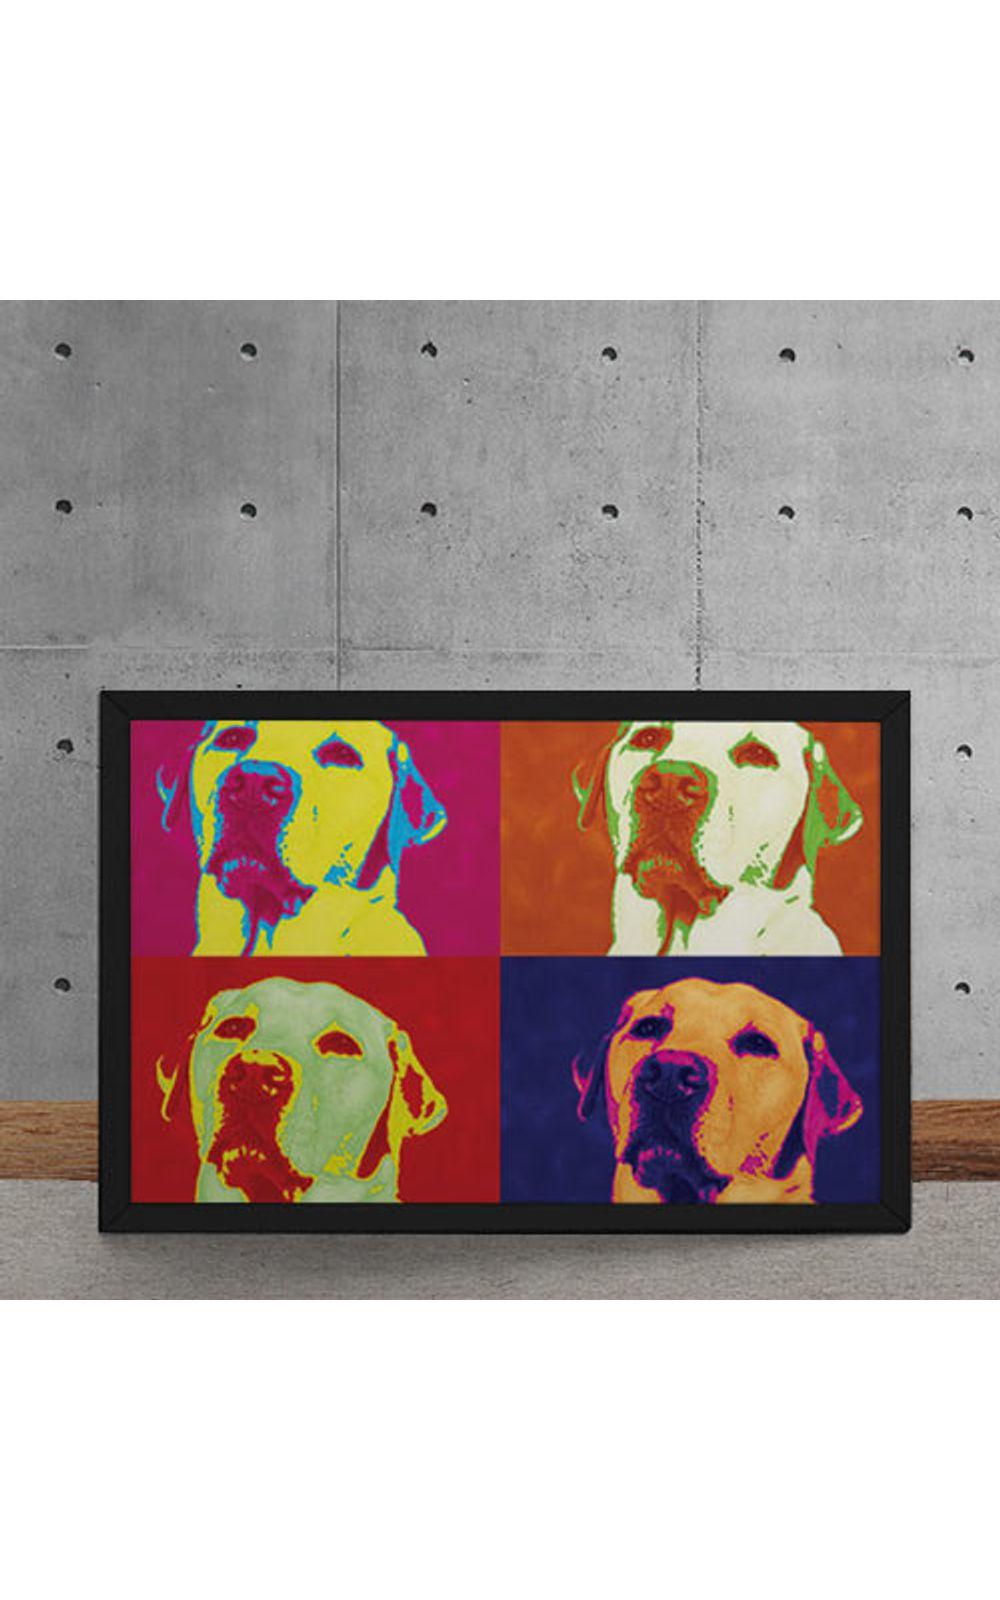 Foto 5 - Quadro Decorativo Andy Warhol Pop Art Cachorro Labrador